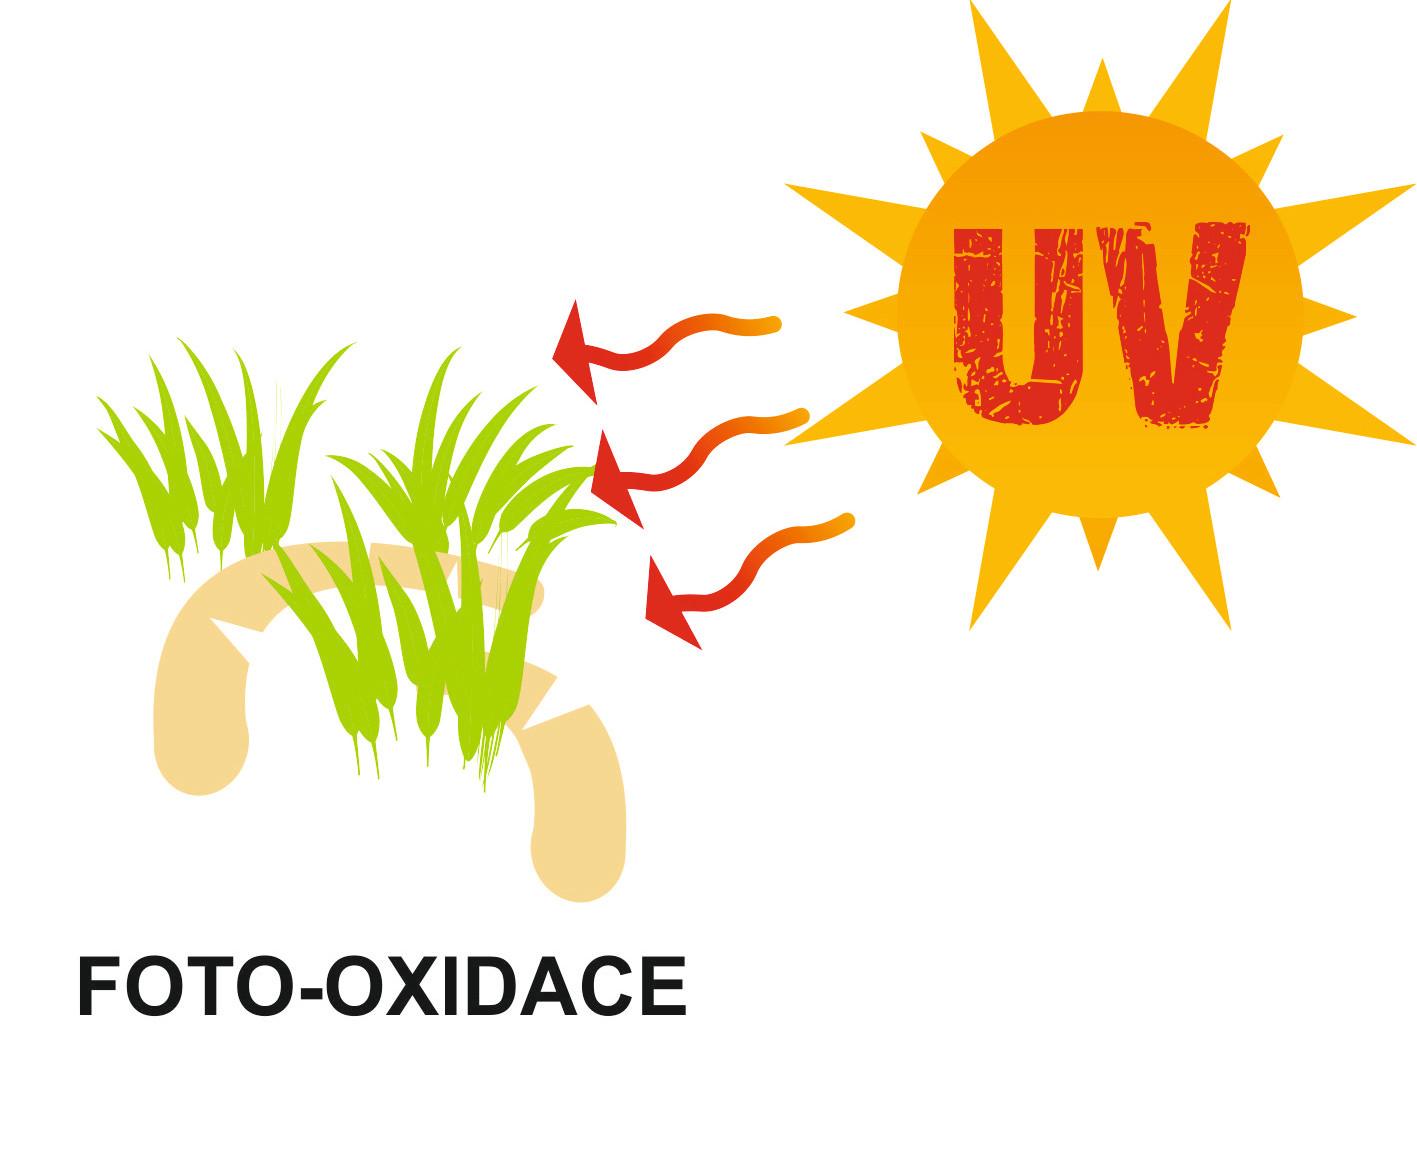 Foto-oxidace